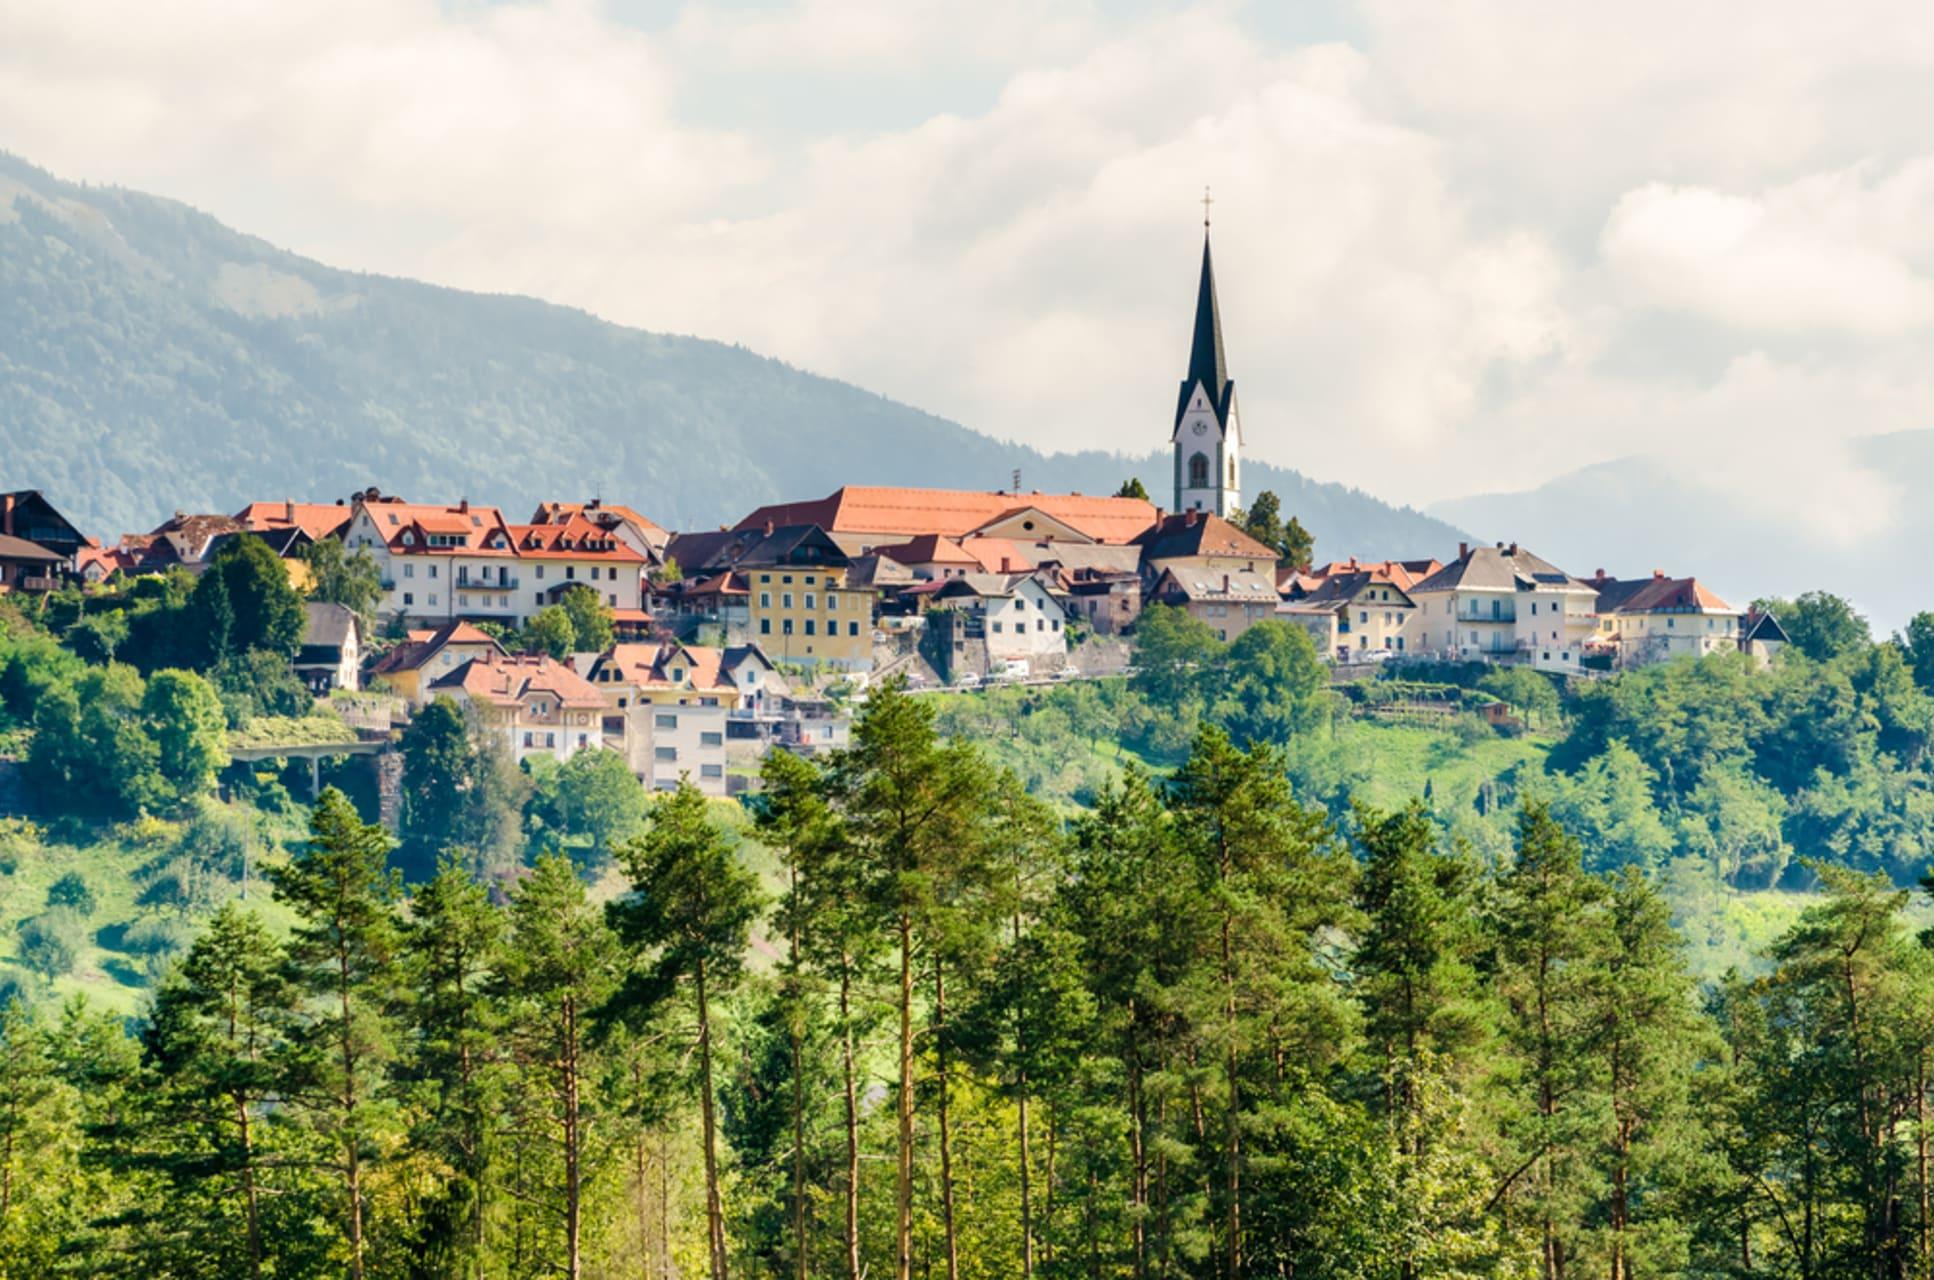 Radovljica - Radovljica, a visit to an honestly sweet town